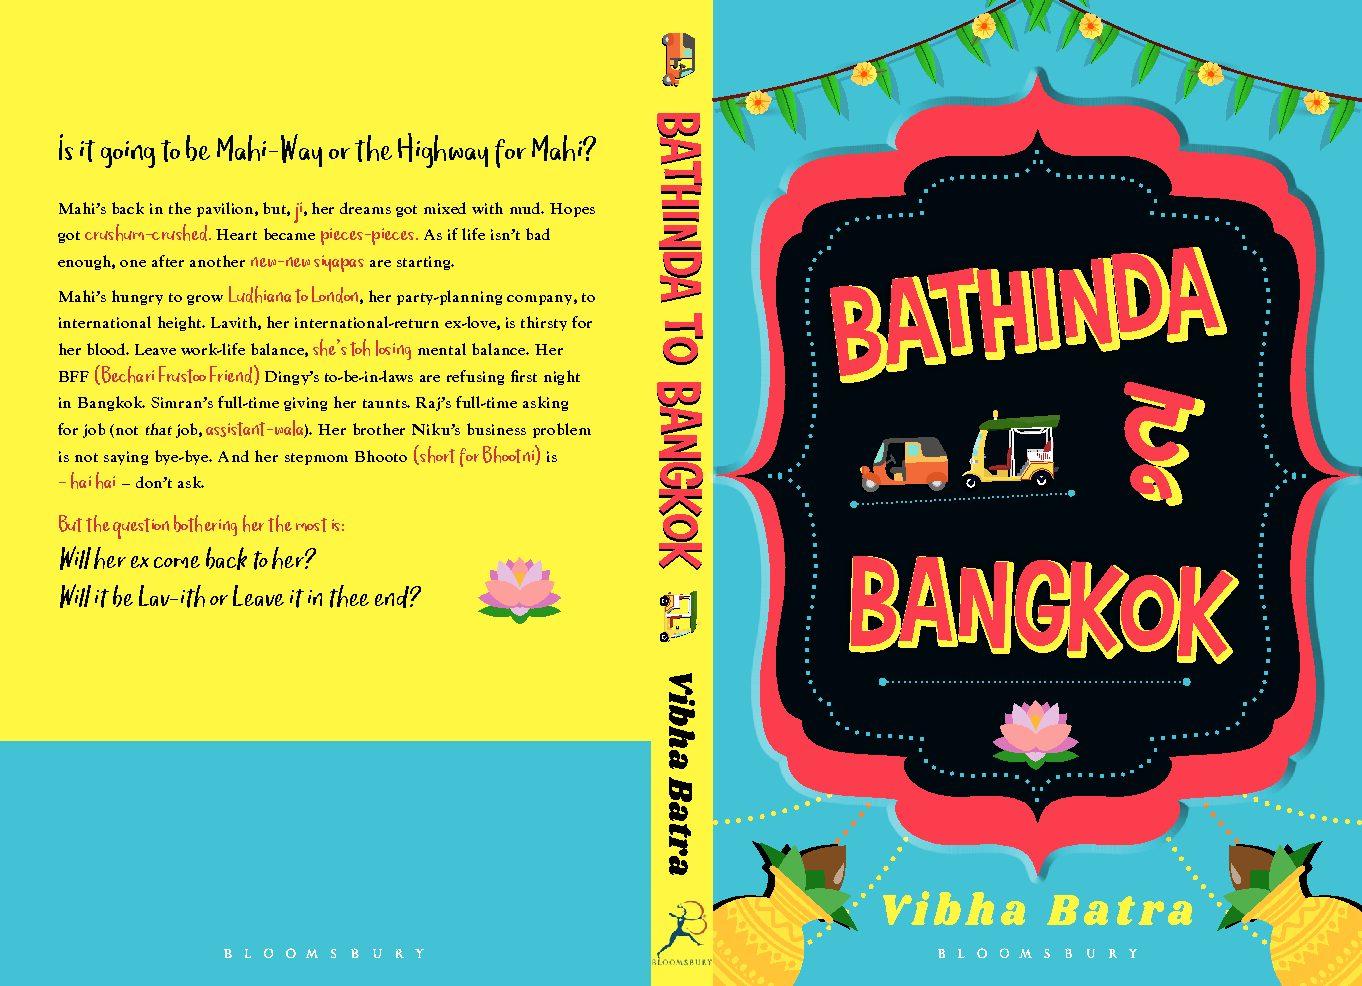 Know Your Author: Vibha Batra